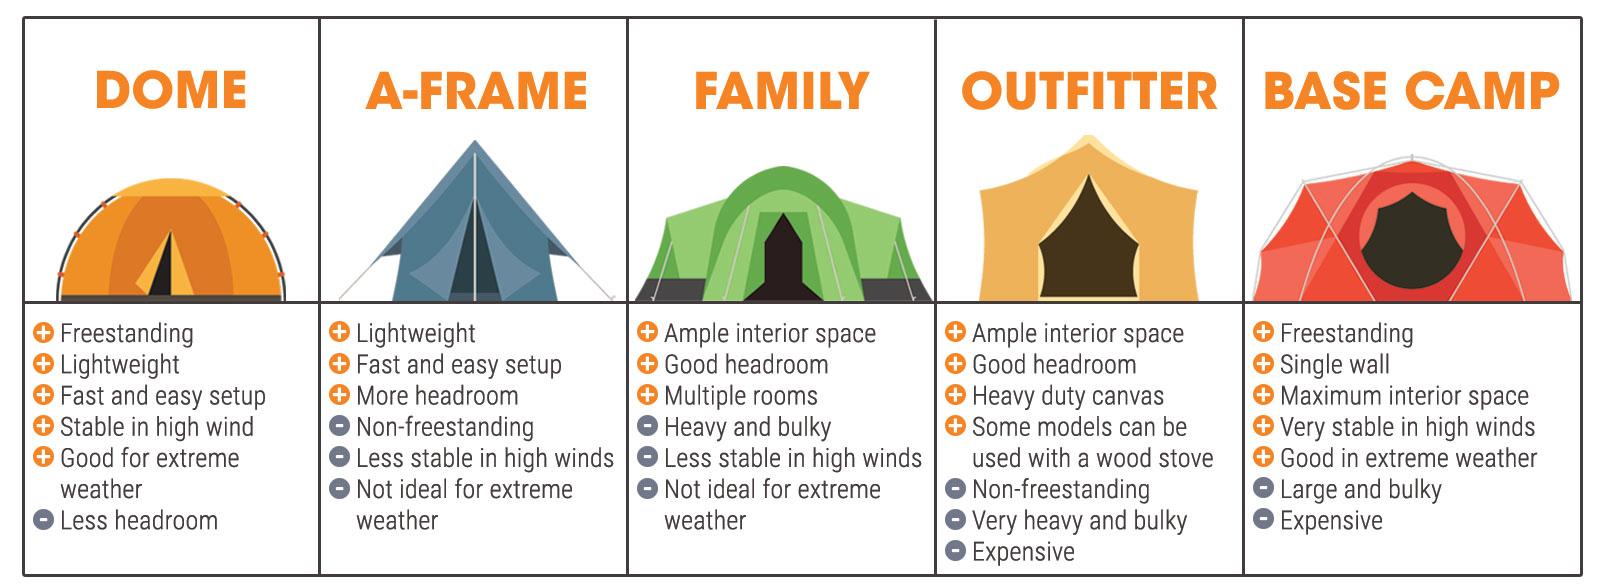 Freestanding Tents vs. Non-Freestanding Tents  sc 1 st  Sierra Trading Post & The Tent Guide: Sierra